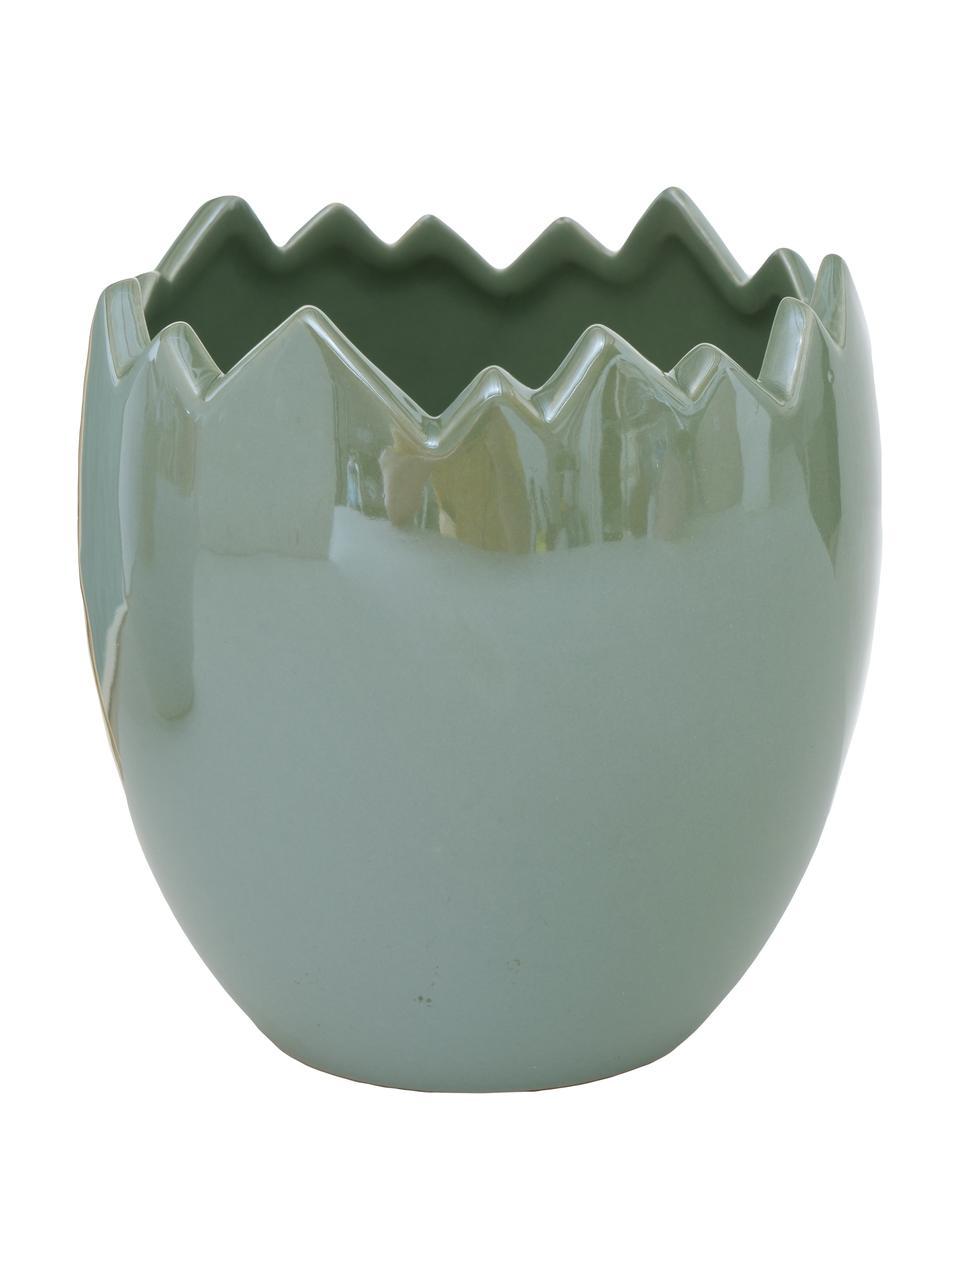 Cache-pot vert et blanc Enya, 3 élém., Vert sauge nacré, blanc cassé nacré